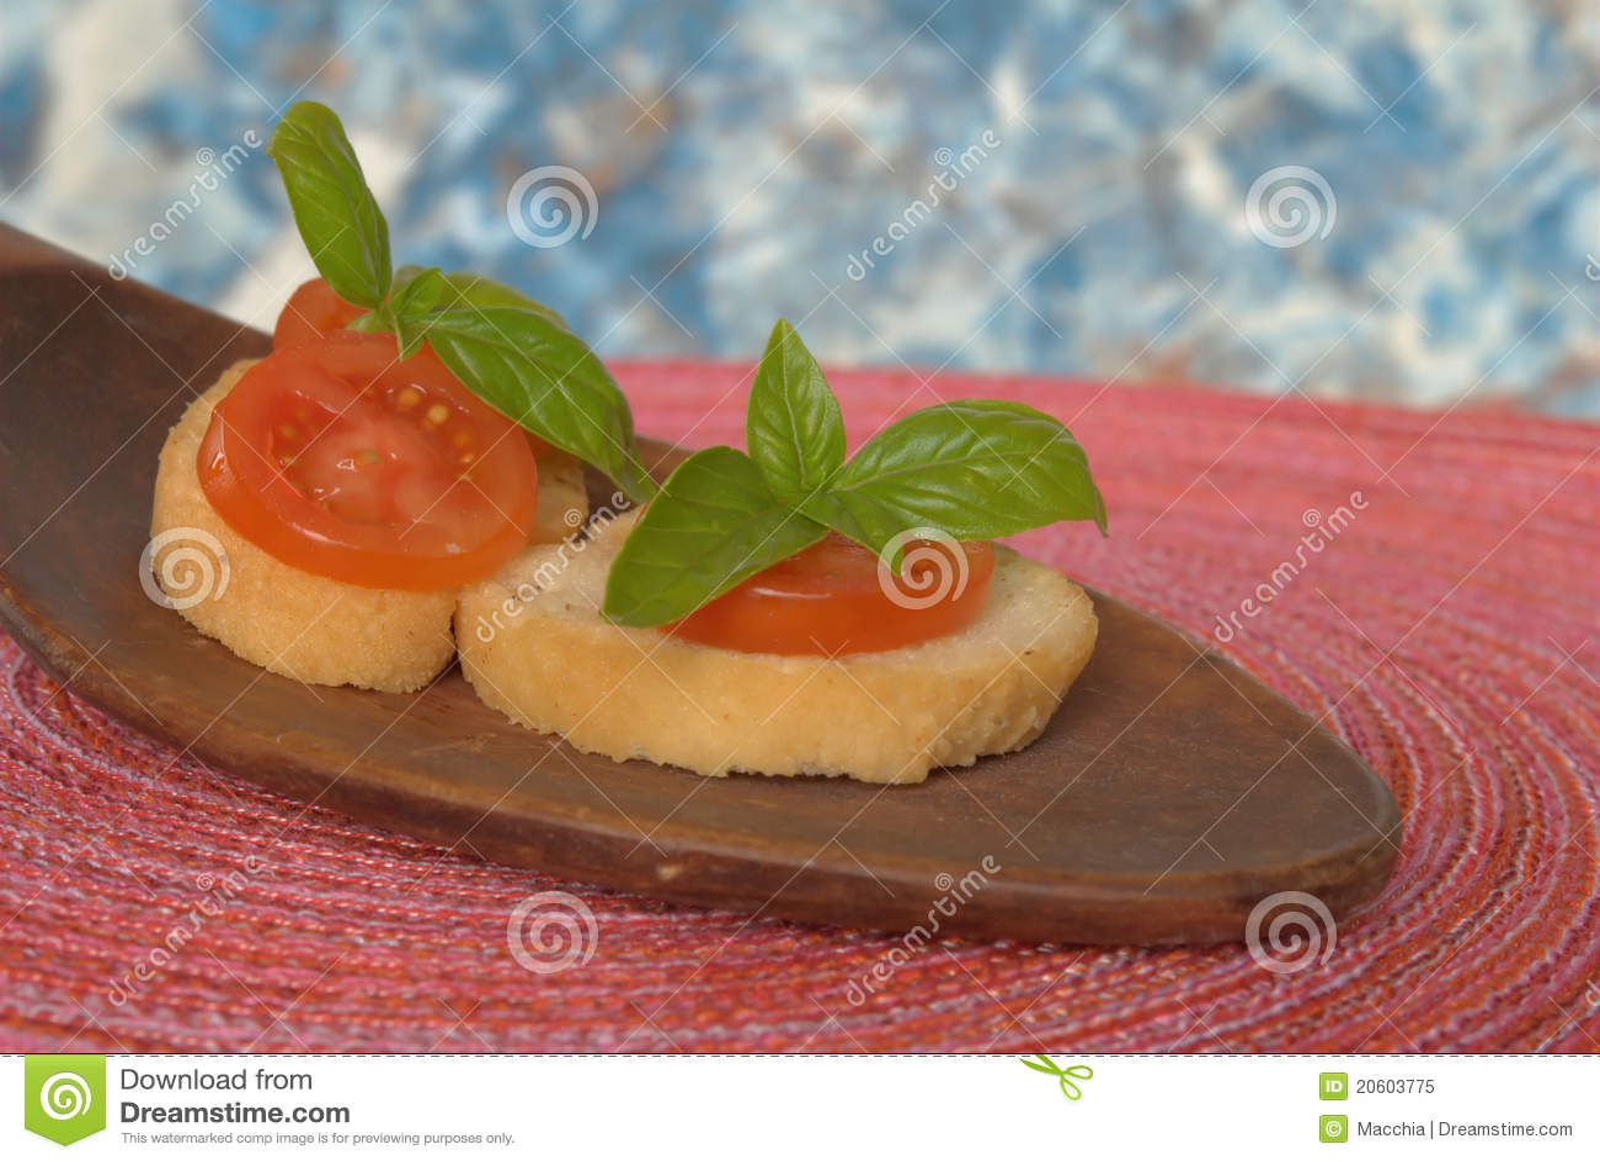 Crostini With Tomato Royalty Free Stock Photo - Image: 20603775